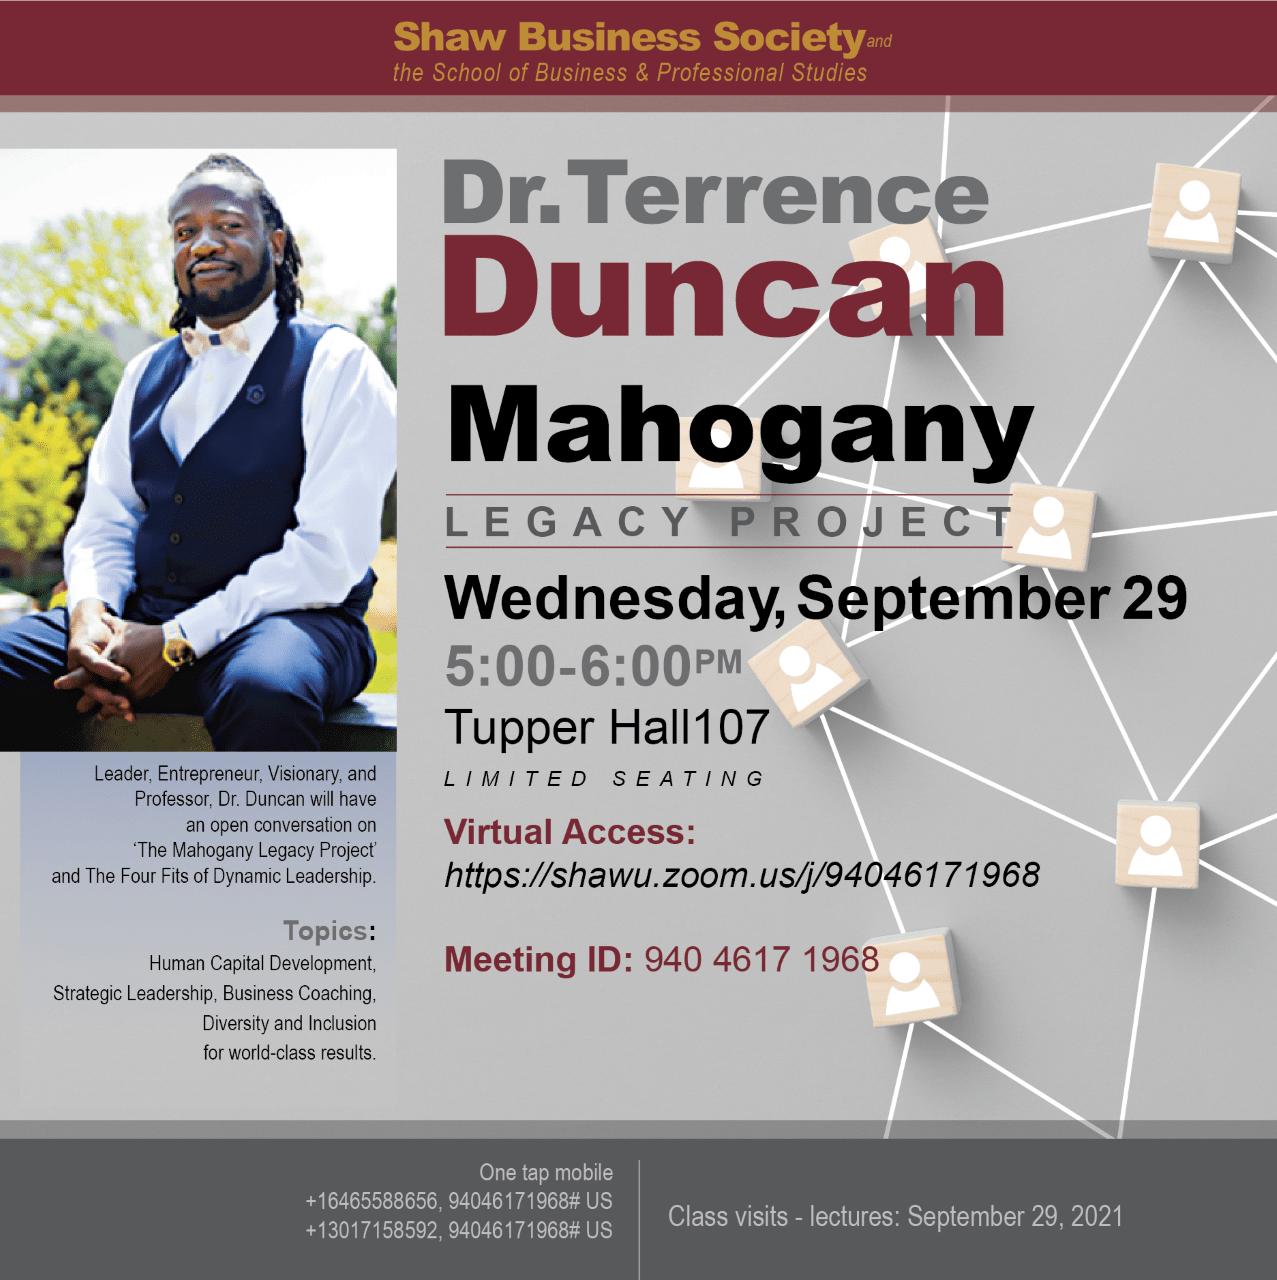 Shaw Business Society: The Mahogany Legacy Project